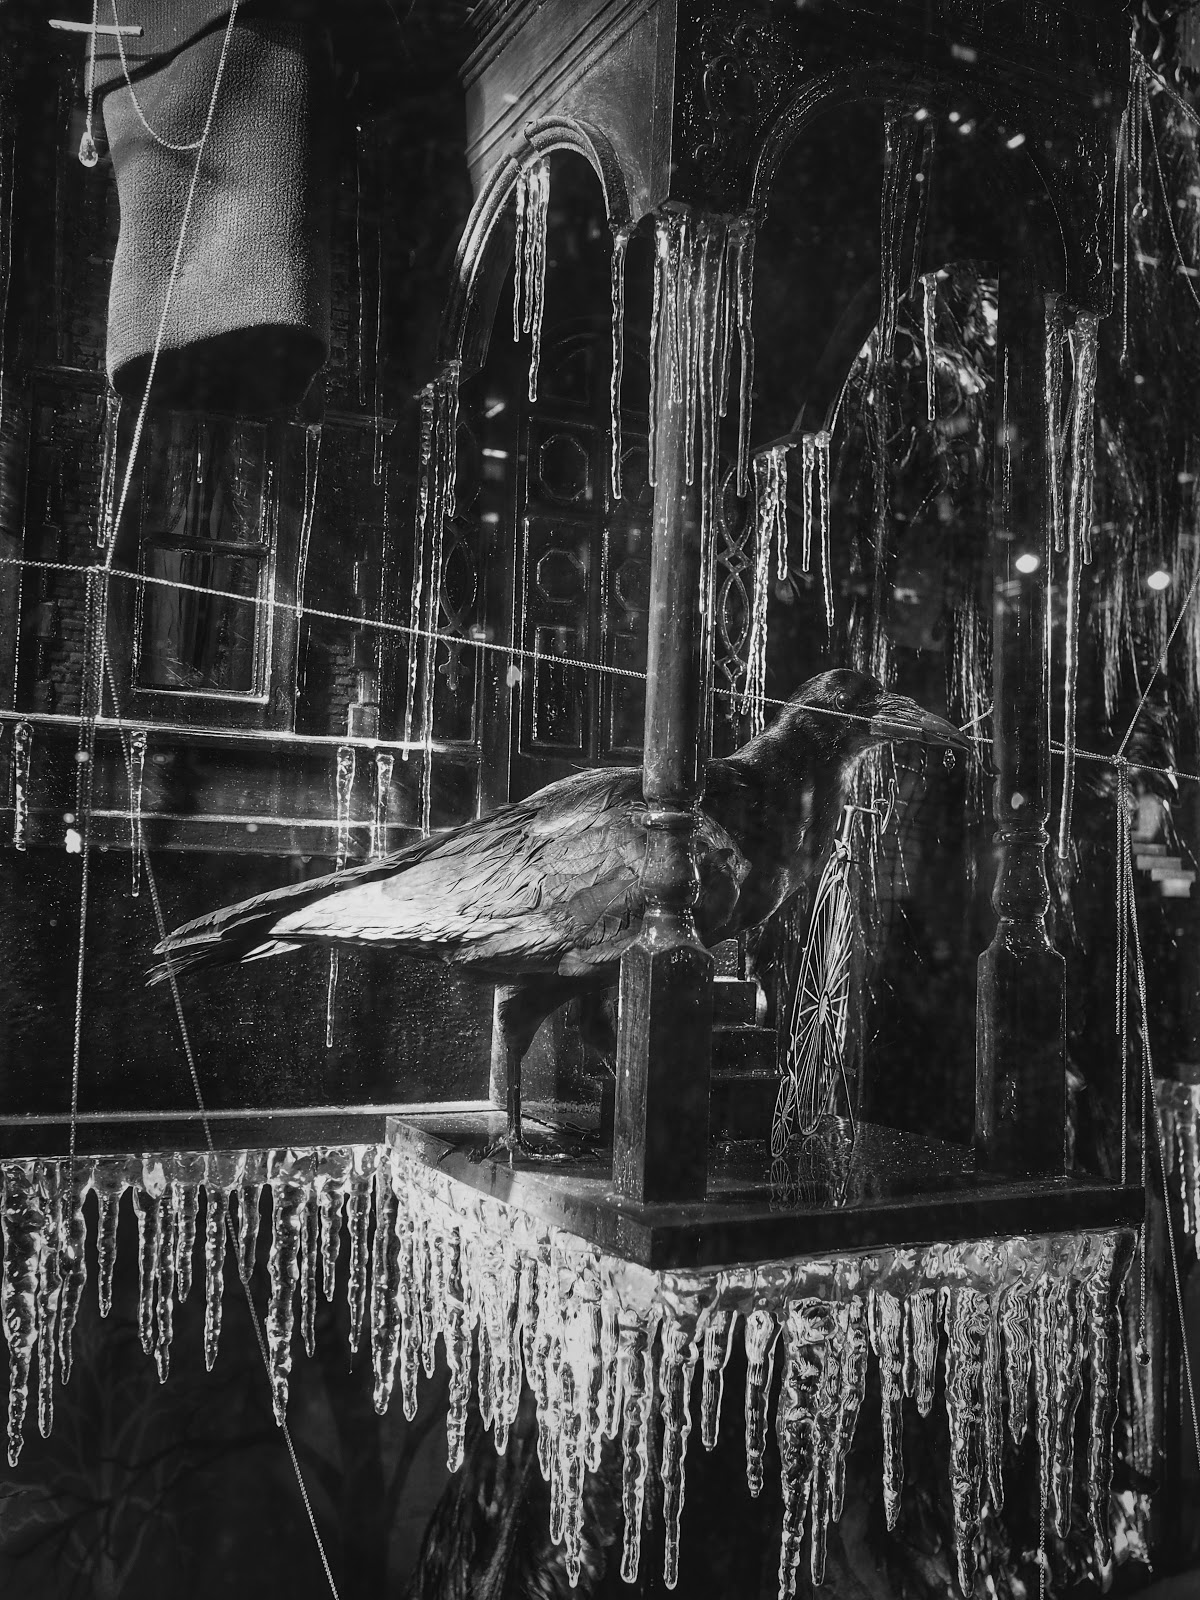 Nevermore, #raven #nevermore #Halloween #spider #holidaysonice #bgwindows #nyc #bergdorf #nyc 2014